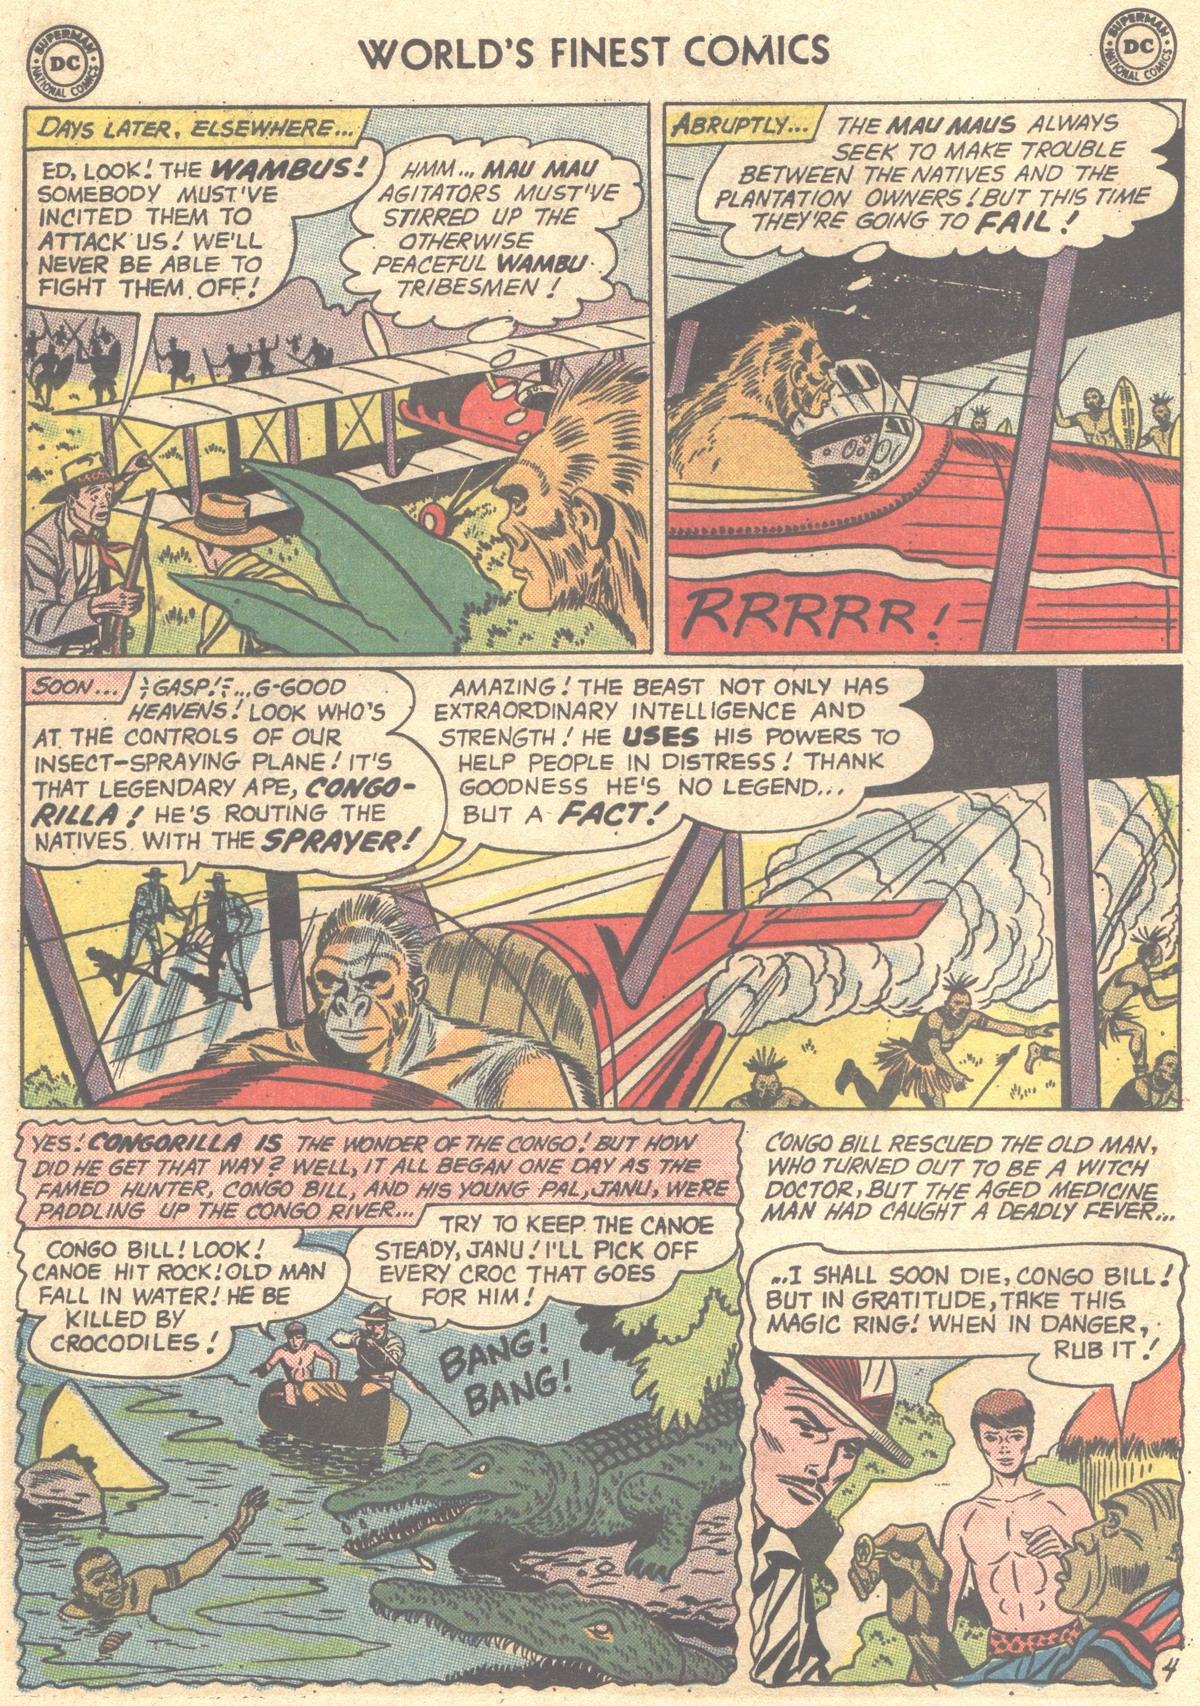 Read online World's Finest Comics comic -  Issue #148 - 28